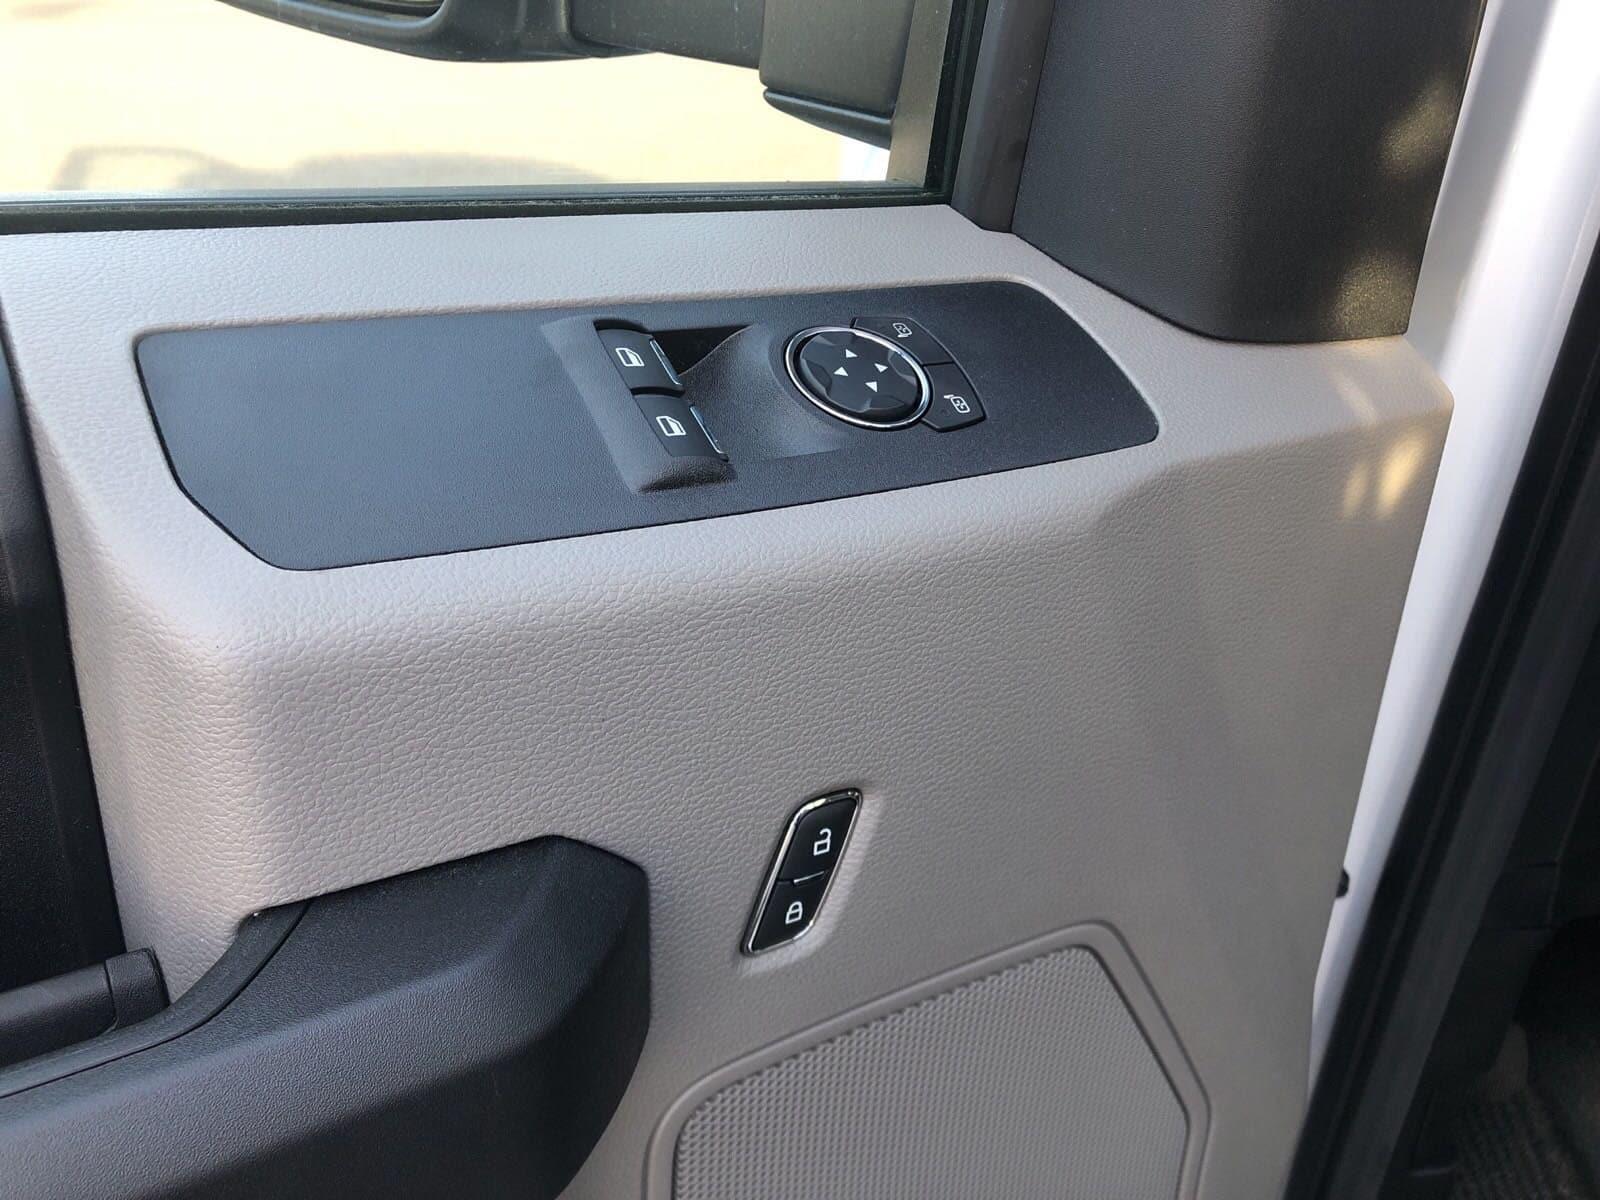 2019 F-350 Regular Cab DRW 4x4,  Scelzi Platform Body #299649 - photo 12